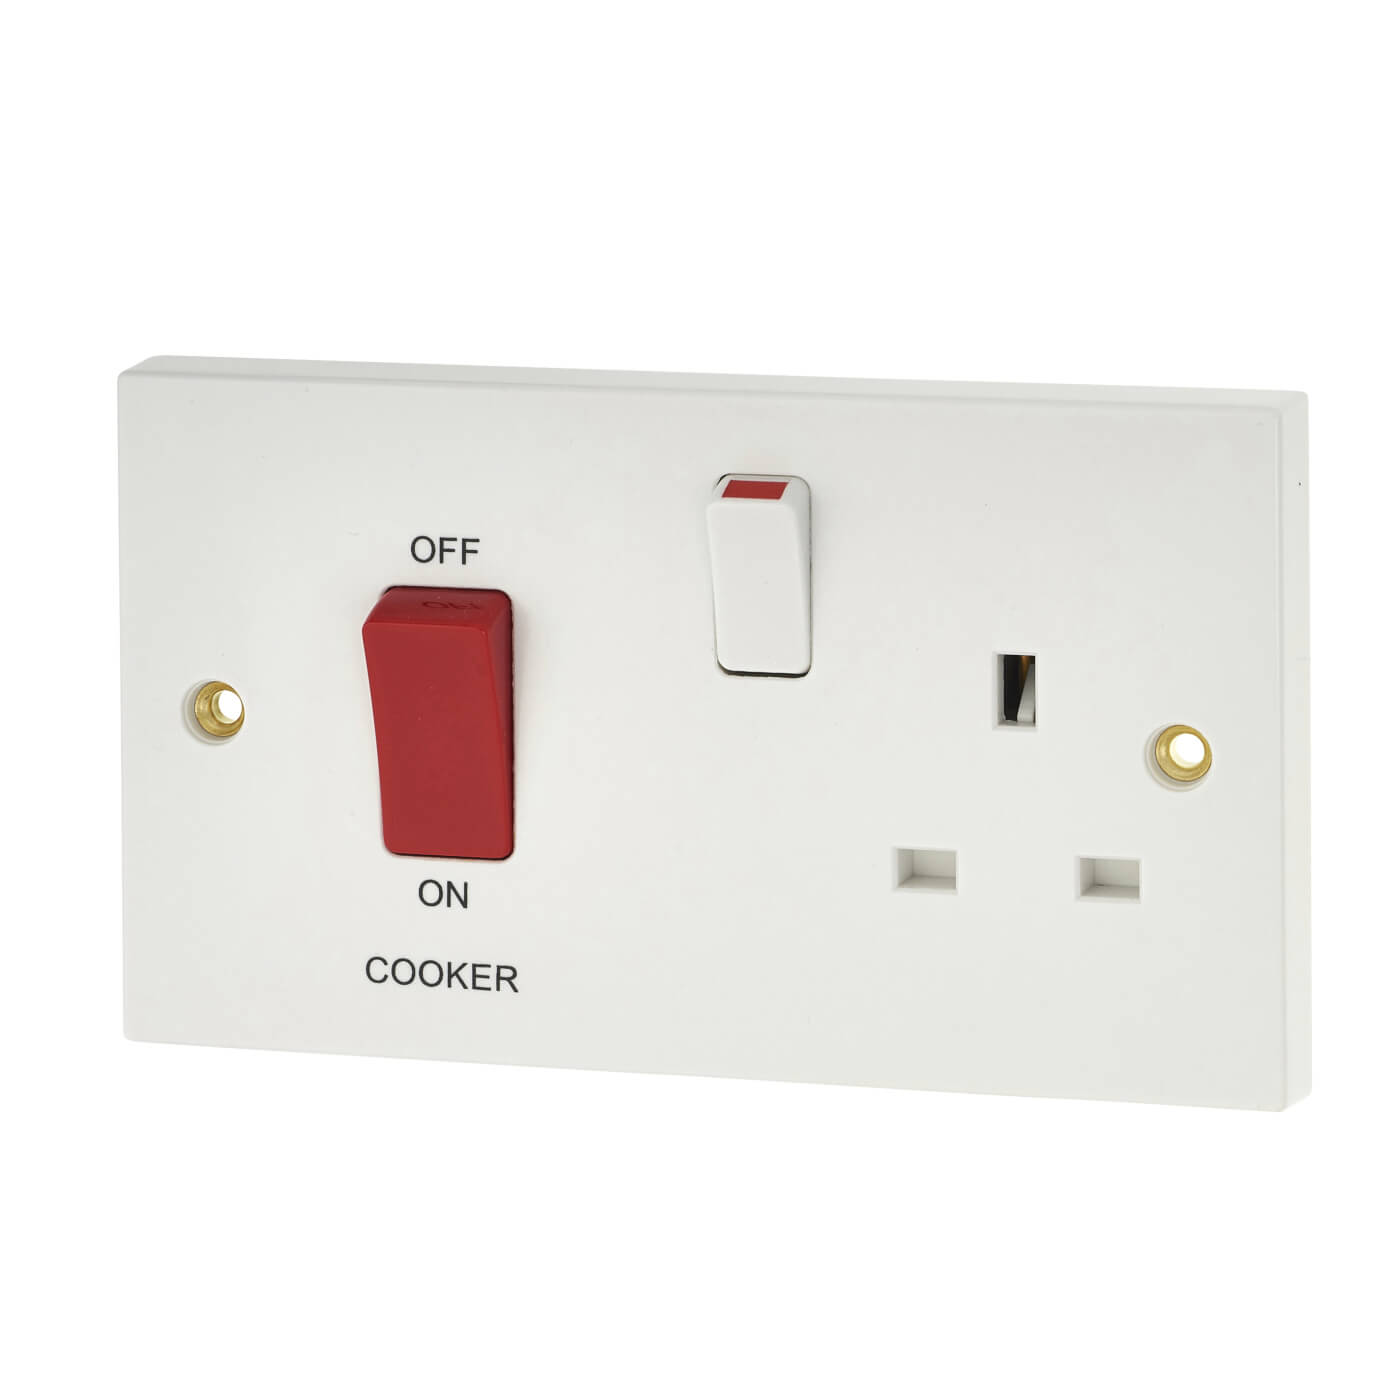 2 gang cooker switch wiring diagram venn and carroll diagrams ks2 bg 45a control socket white